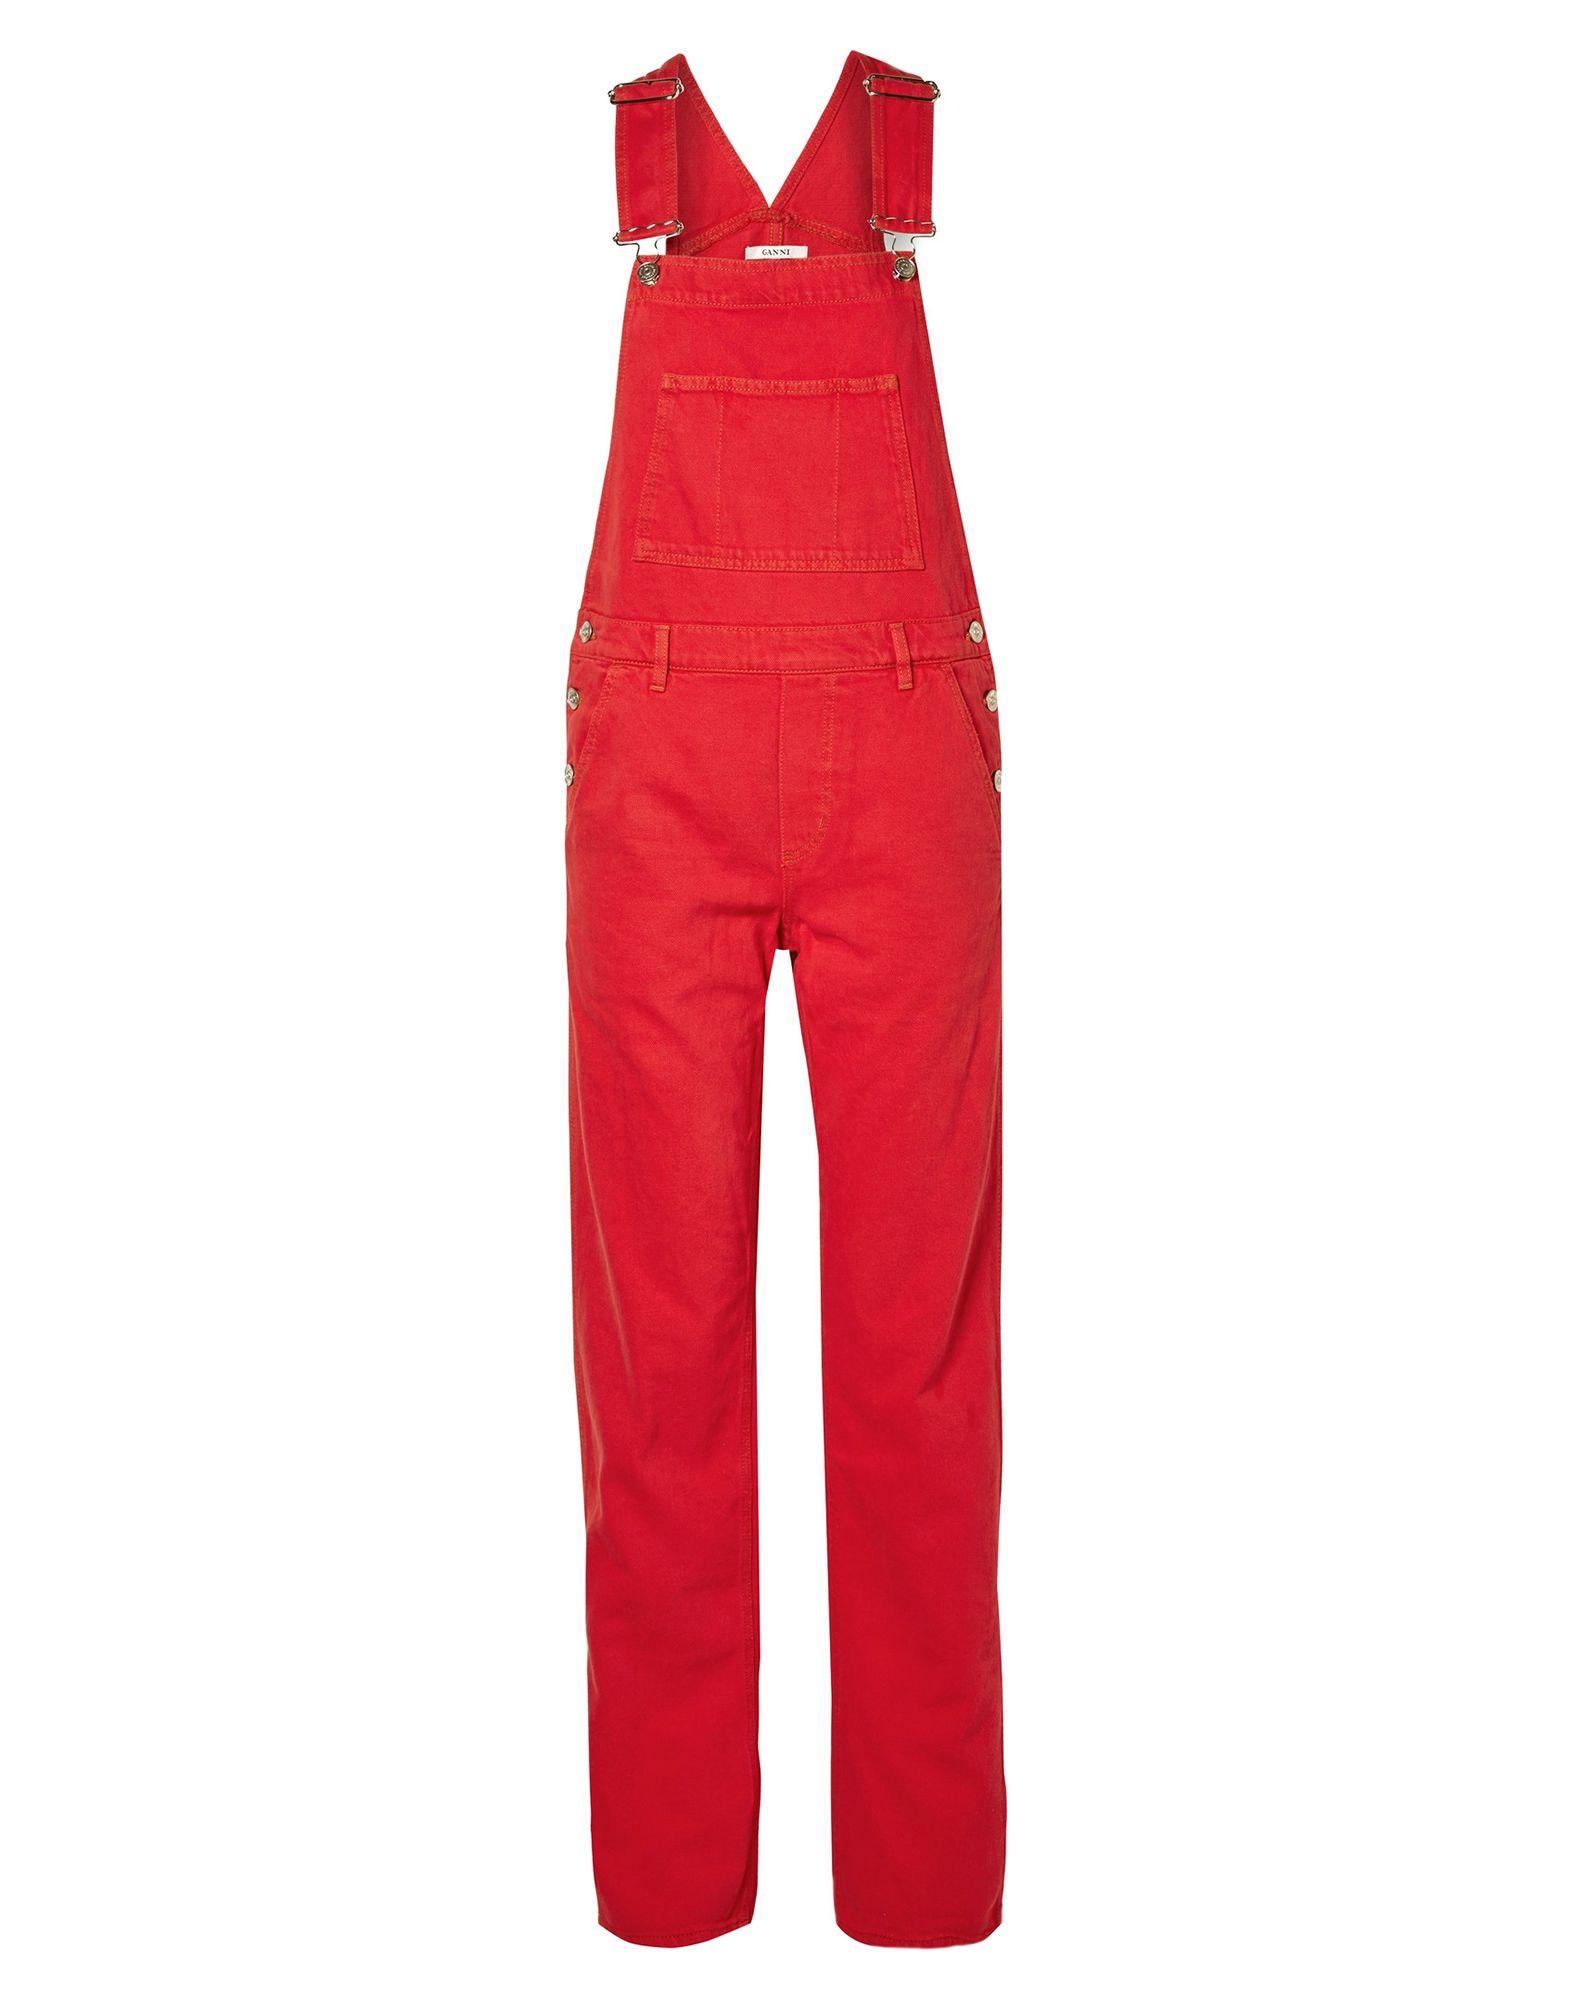 GANNI Overalls. denim, no appliqués, solid color, overalls top, sleeveless, multipockets, button closing, side closure. 100% Cotton